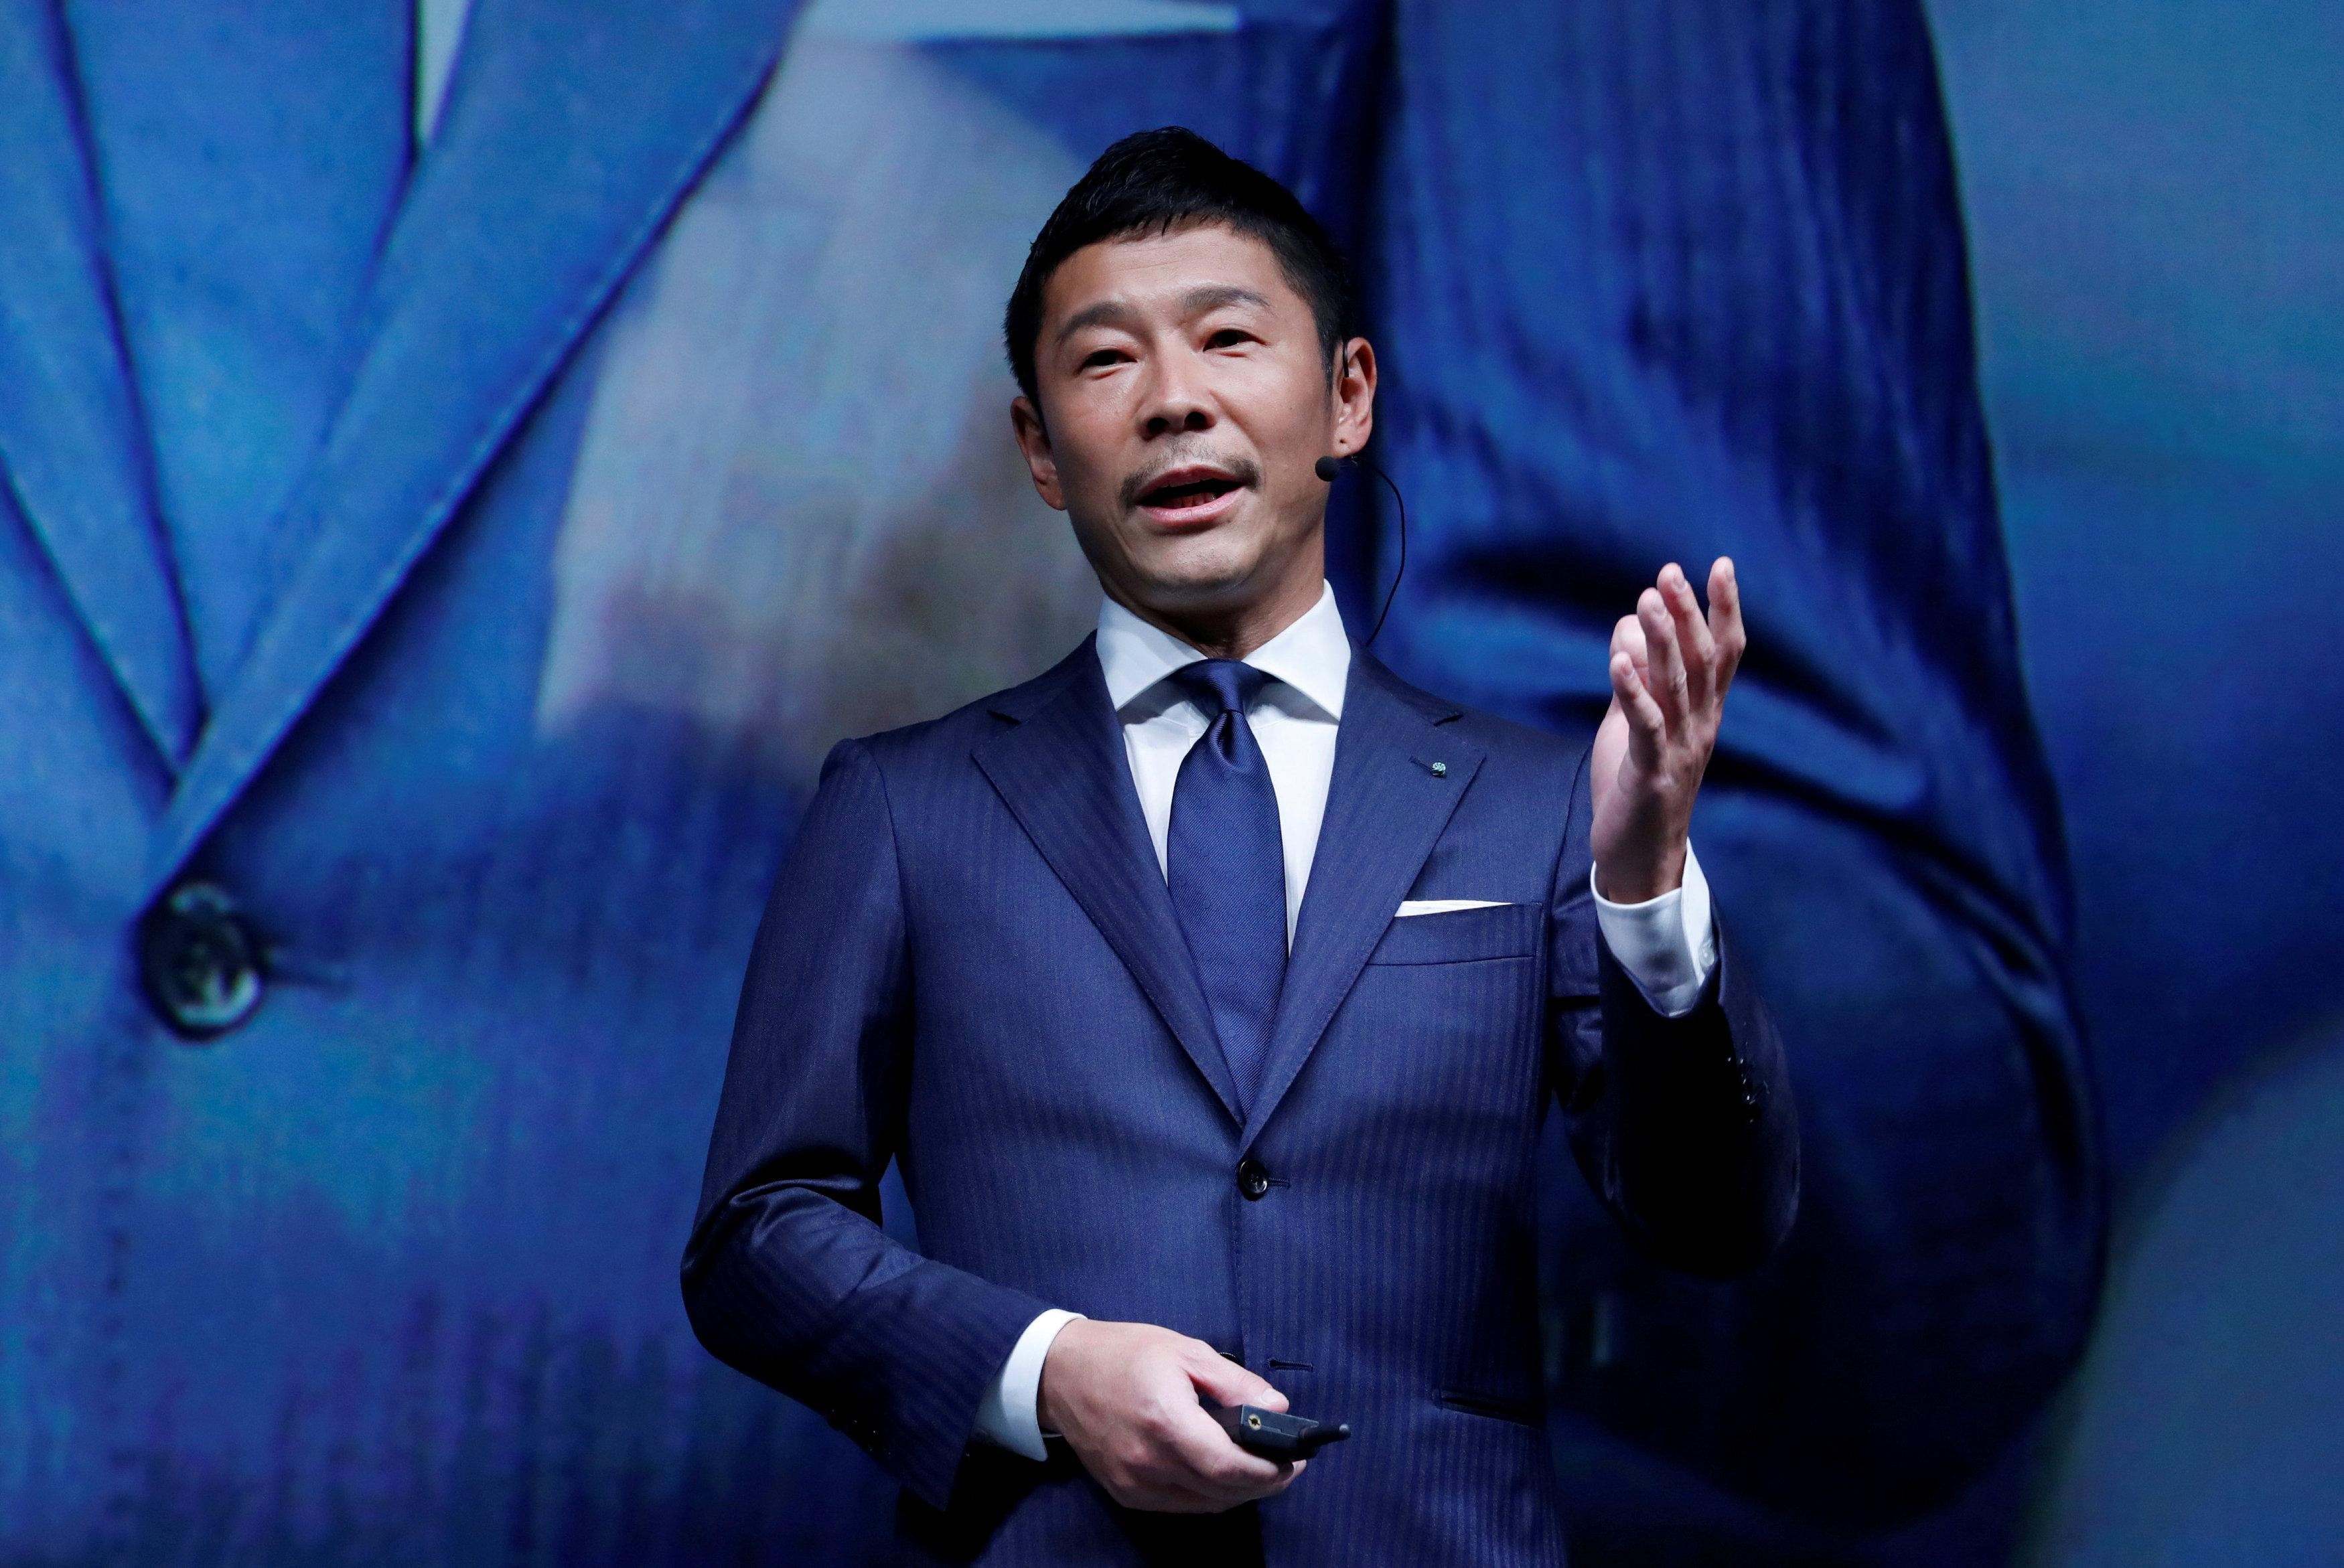 Japan fashion guru Maezawa lands first SpaceX moon flight